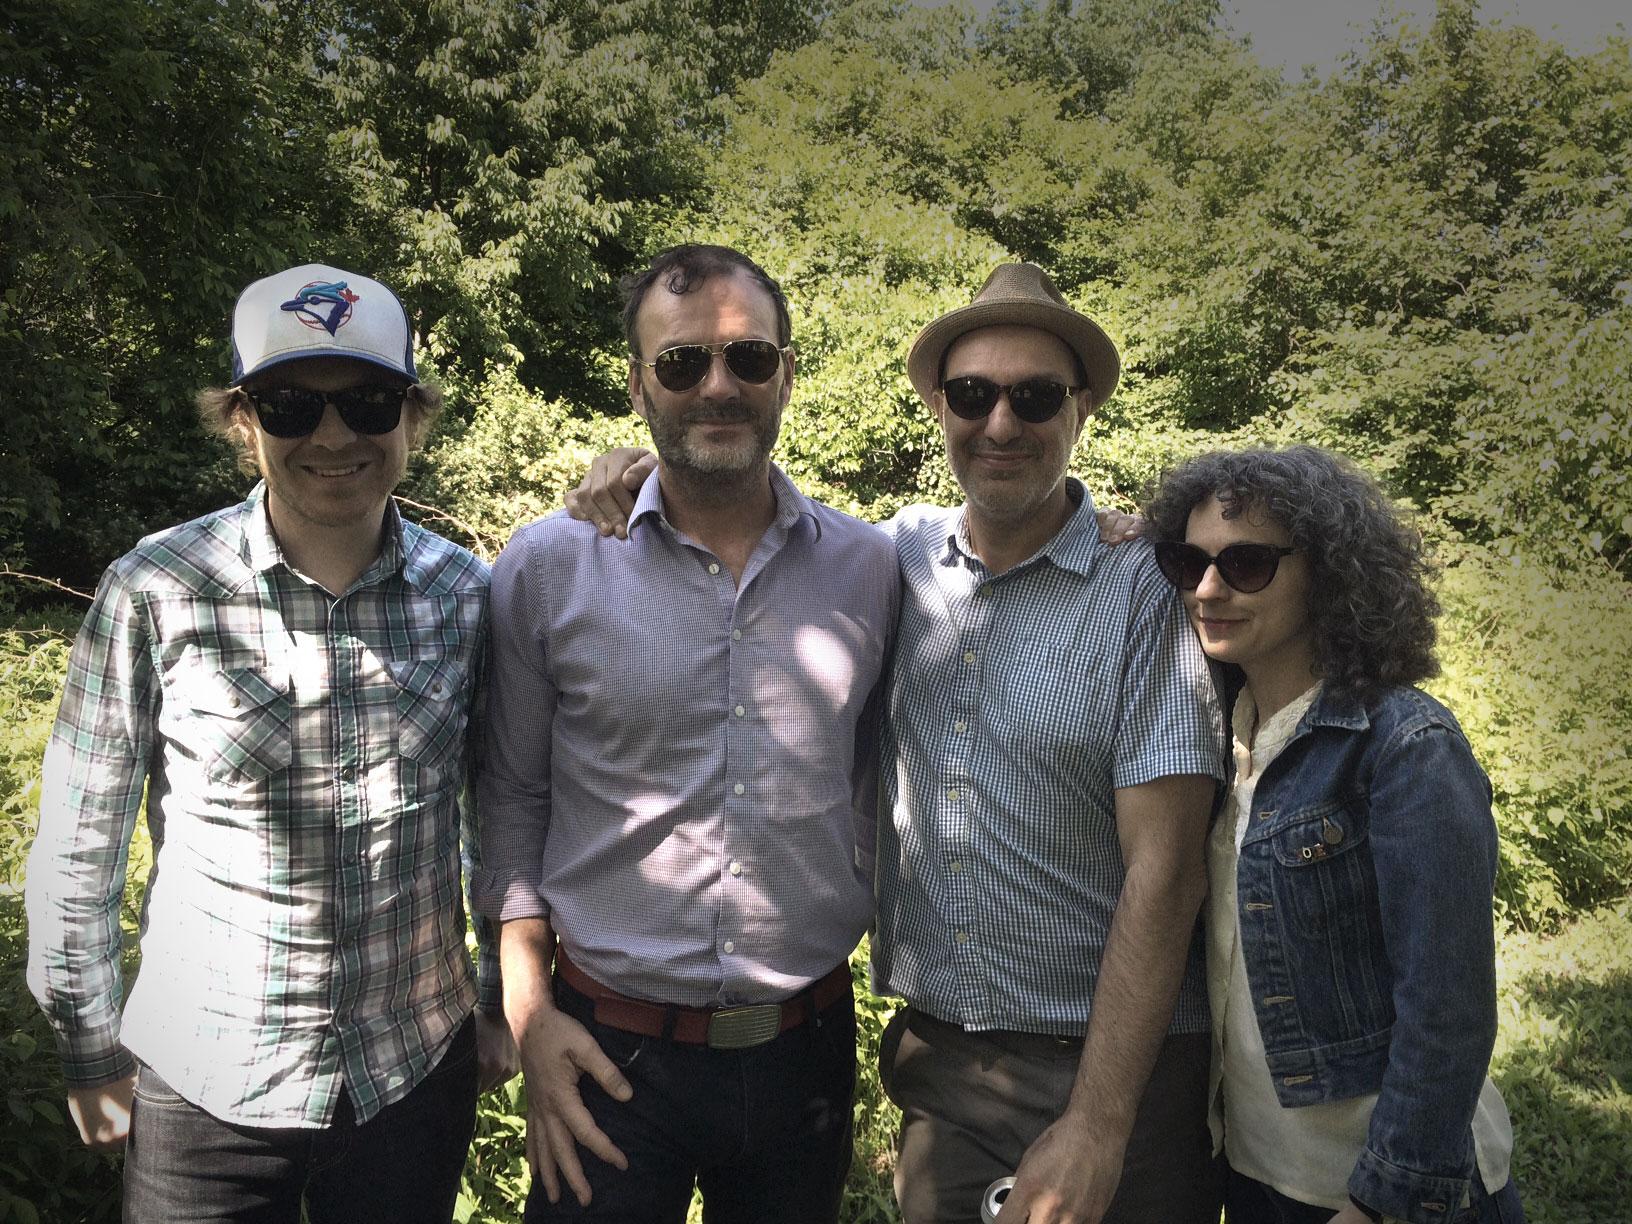 Left to right: Mark Medley, Mark Mattson, Dave Bidini, and Janet Morassutti at last year's Litfest. (Photo via Lake Ontario Waterkeeper)